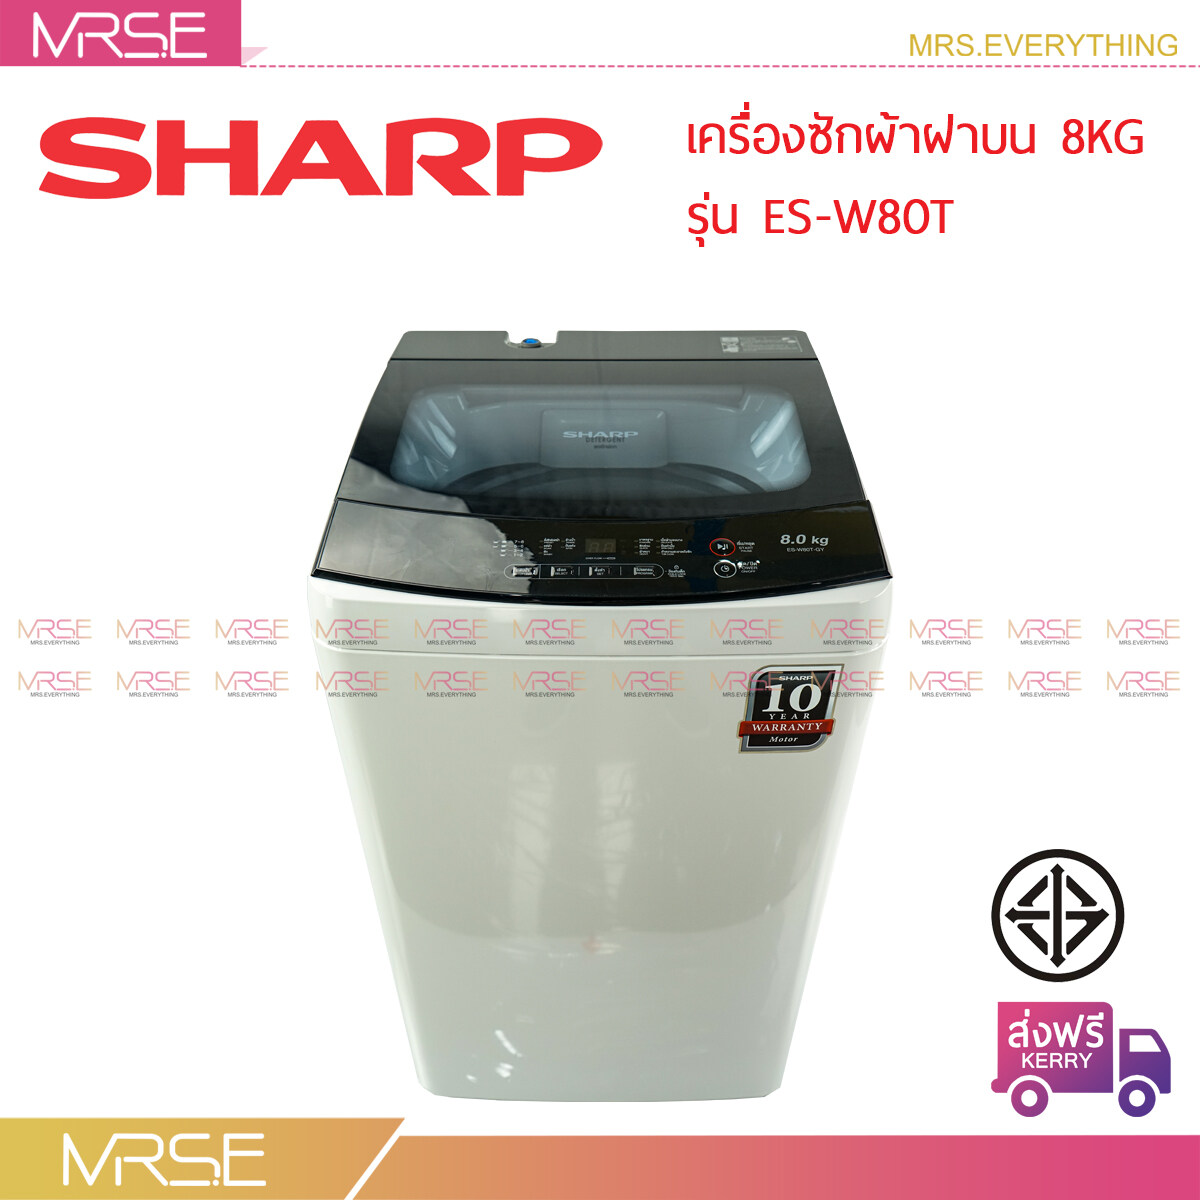 SHARP เครื่องซักผ้าฝาบน ขนาด 8 กก. รุ่น ES-W80T-GY รับประกันมอเตอร์ 10 ปี